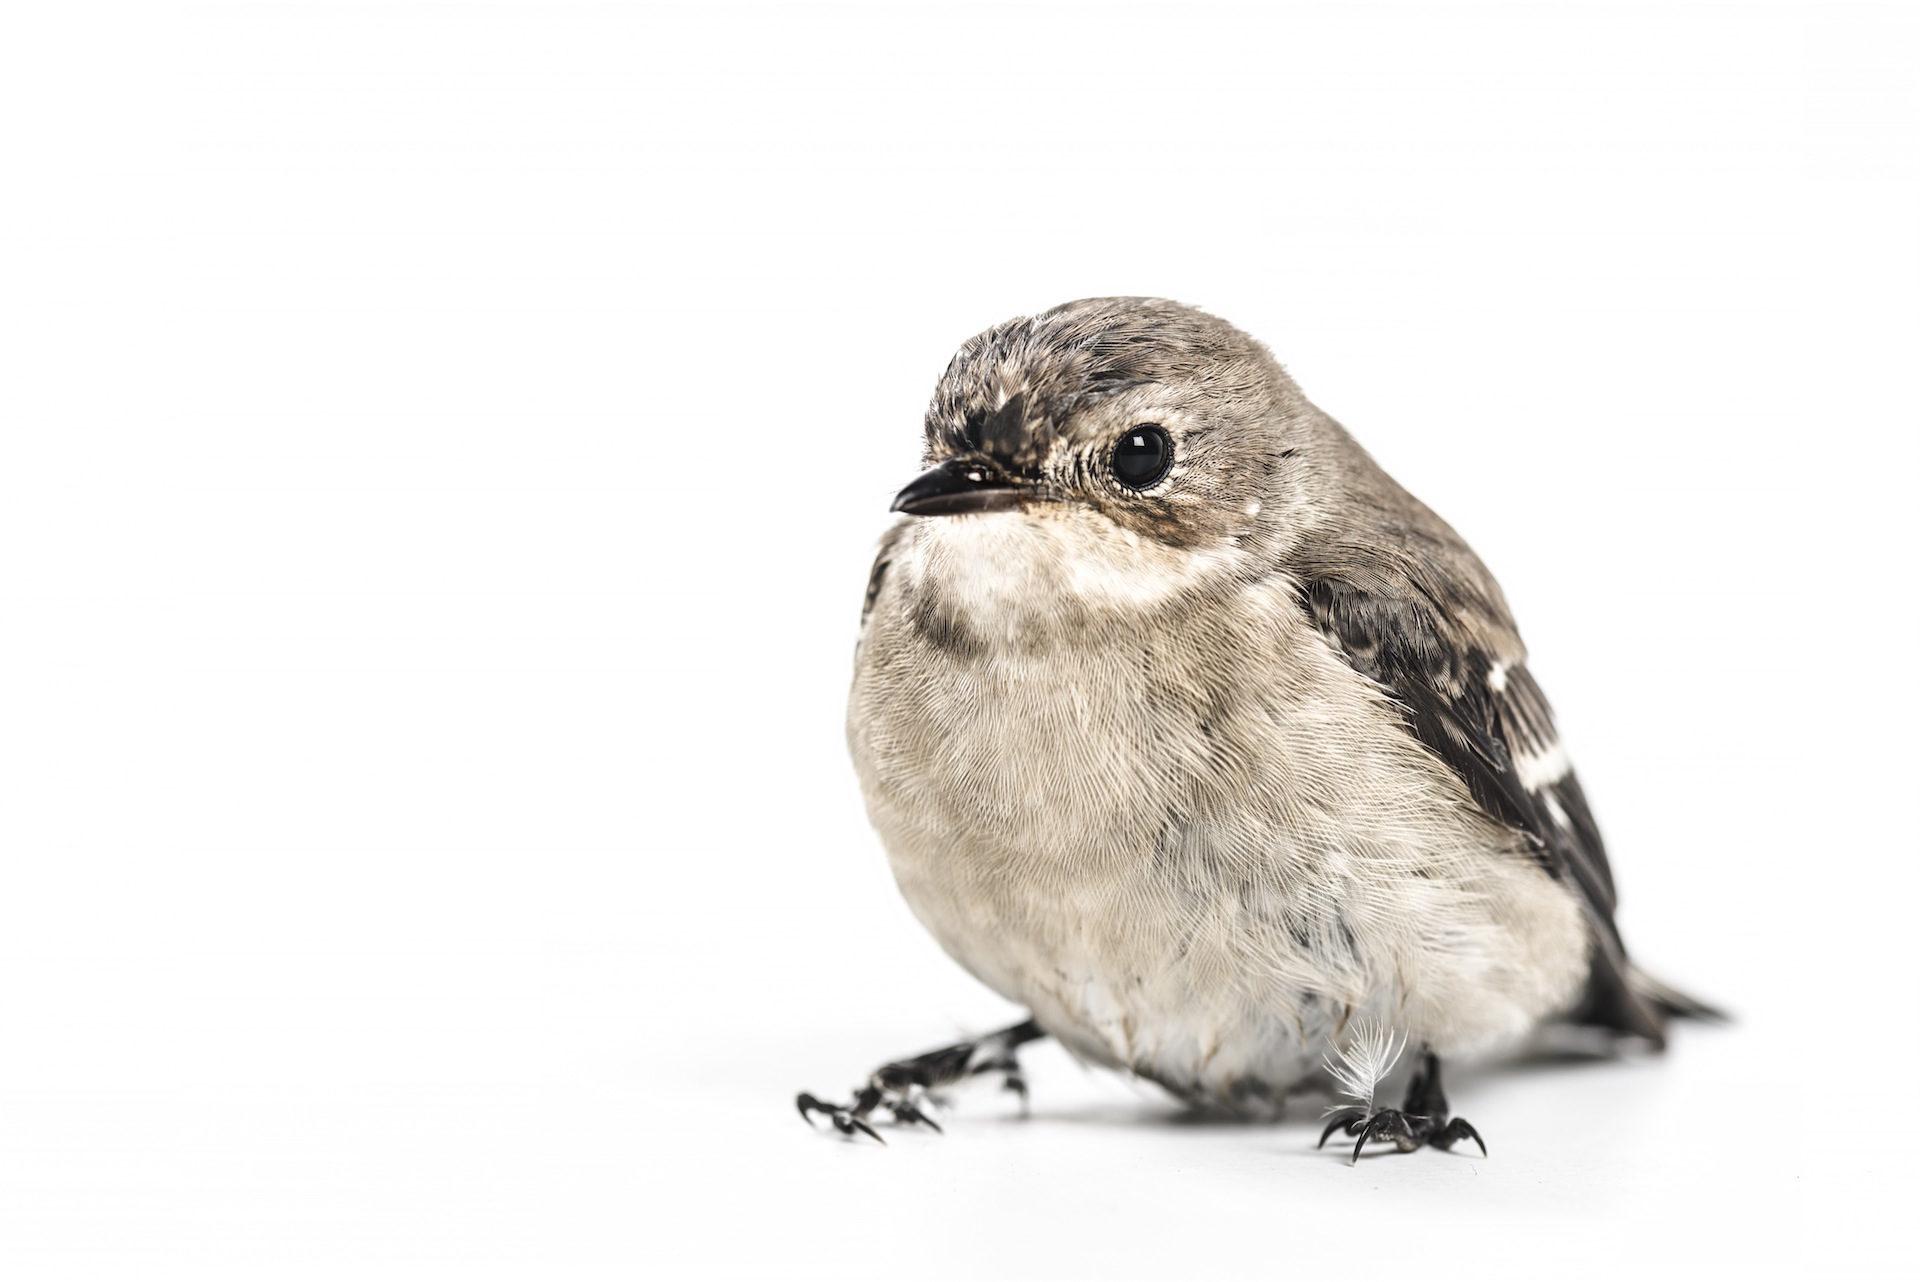 gorrión, 鳥, 外観, 目, 羽 - HD の壁紙 - 教授-falken.com